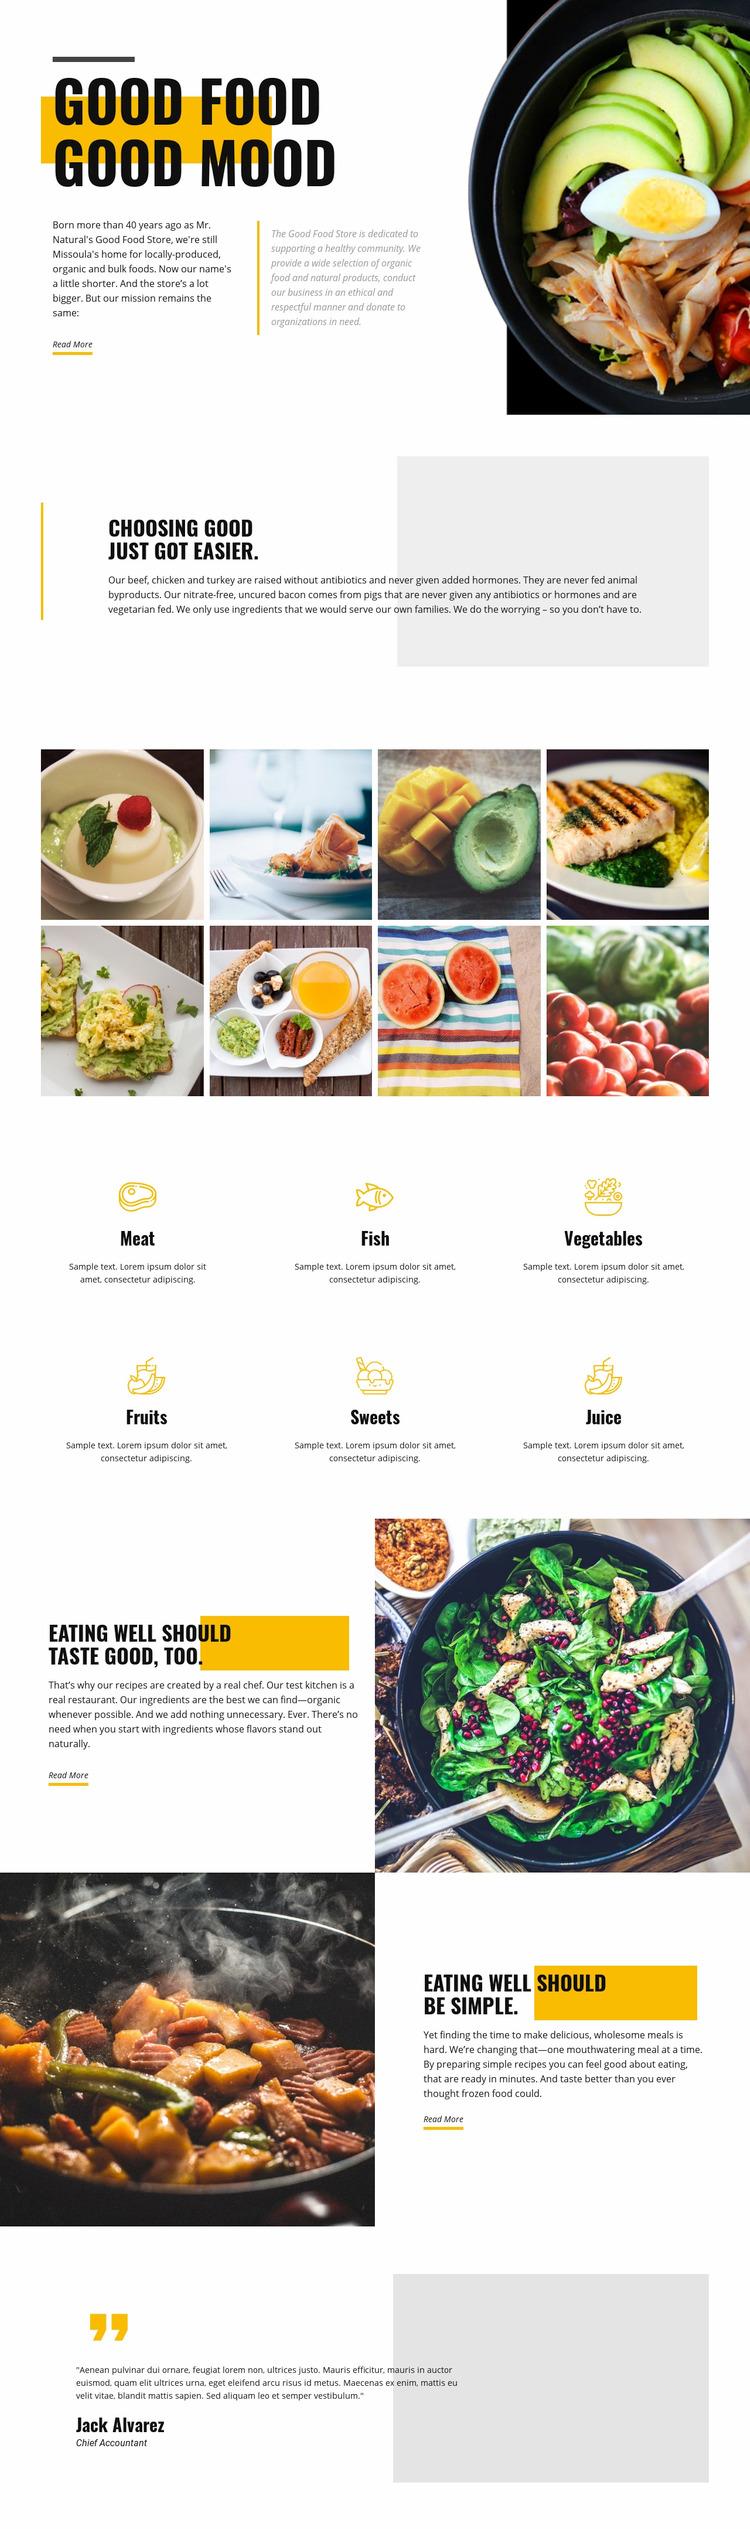 Good mood good food Website Maker